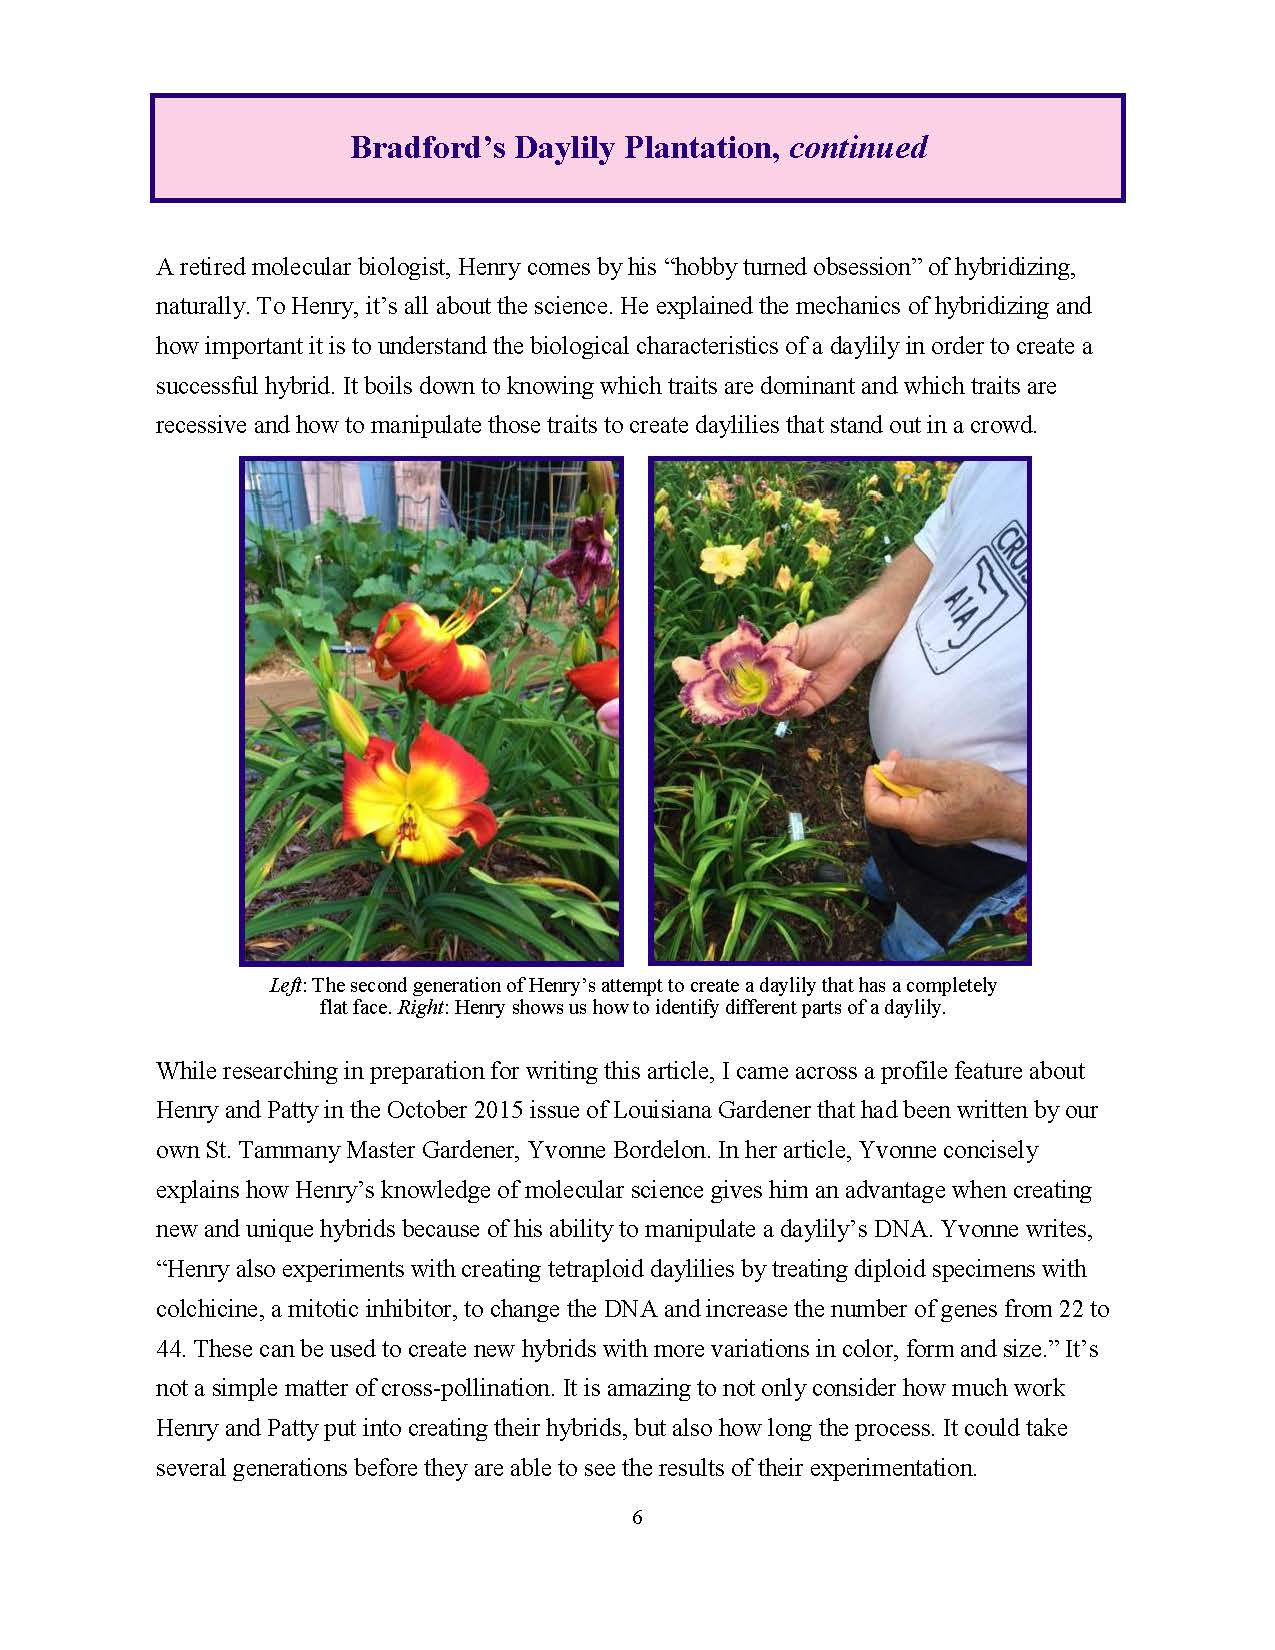 June 2017 Gardengoer_Page_06.jpg